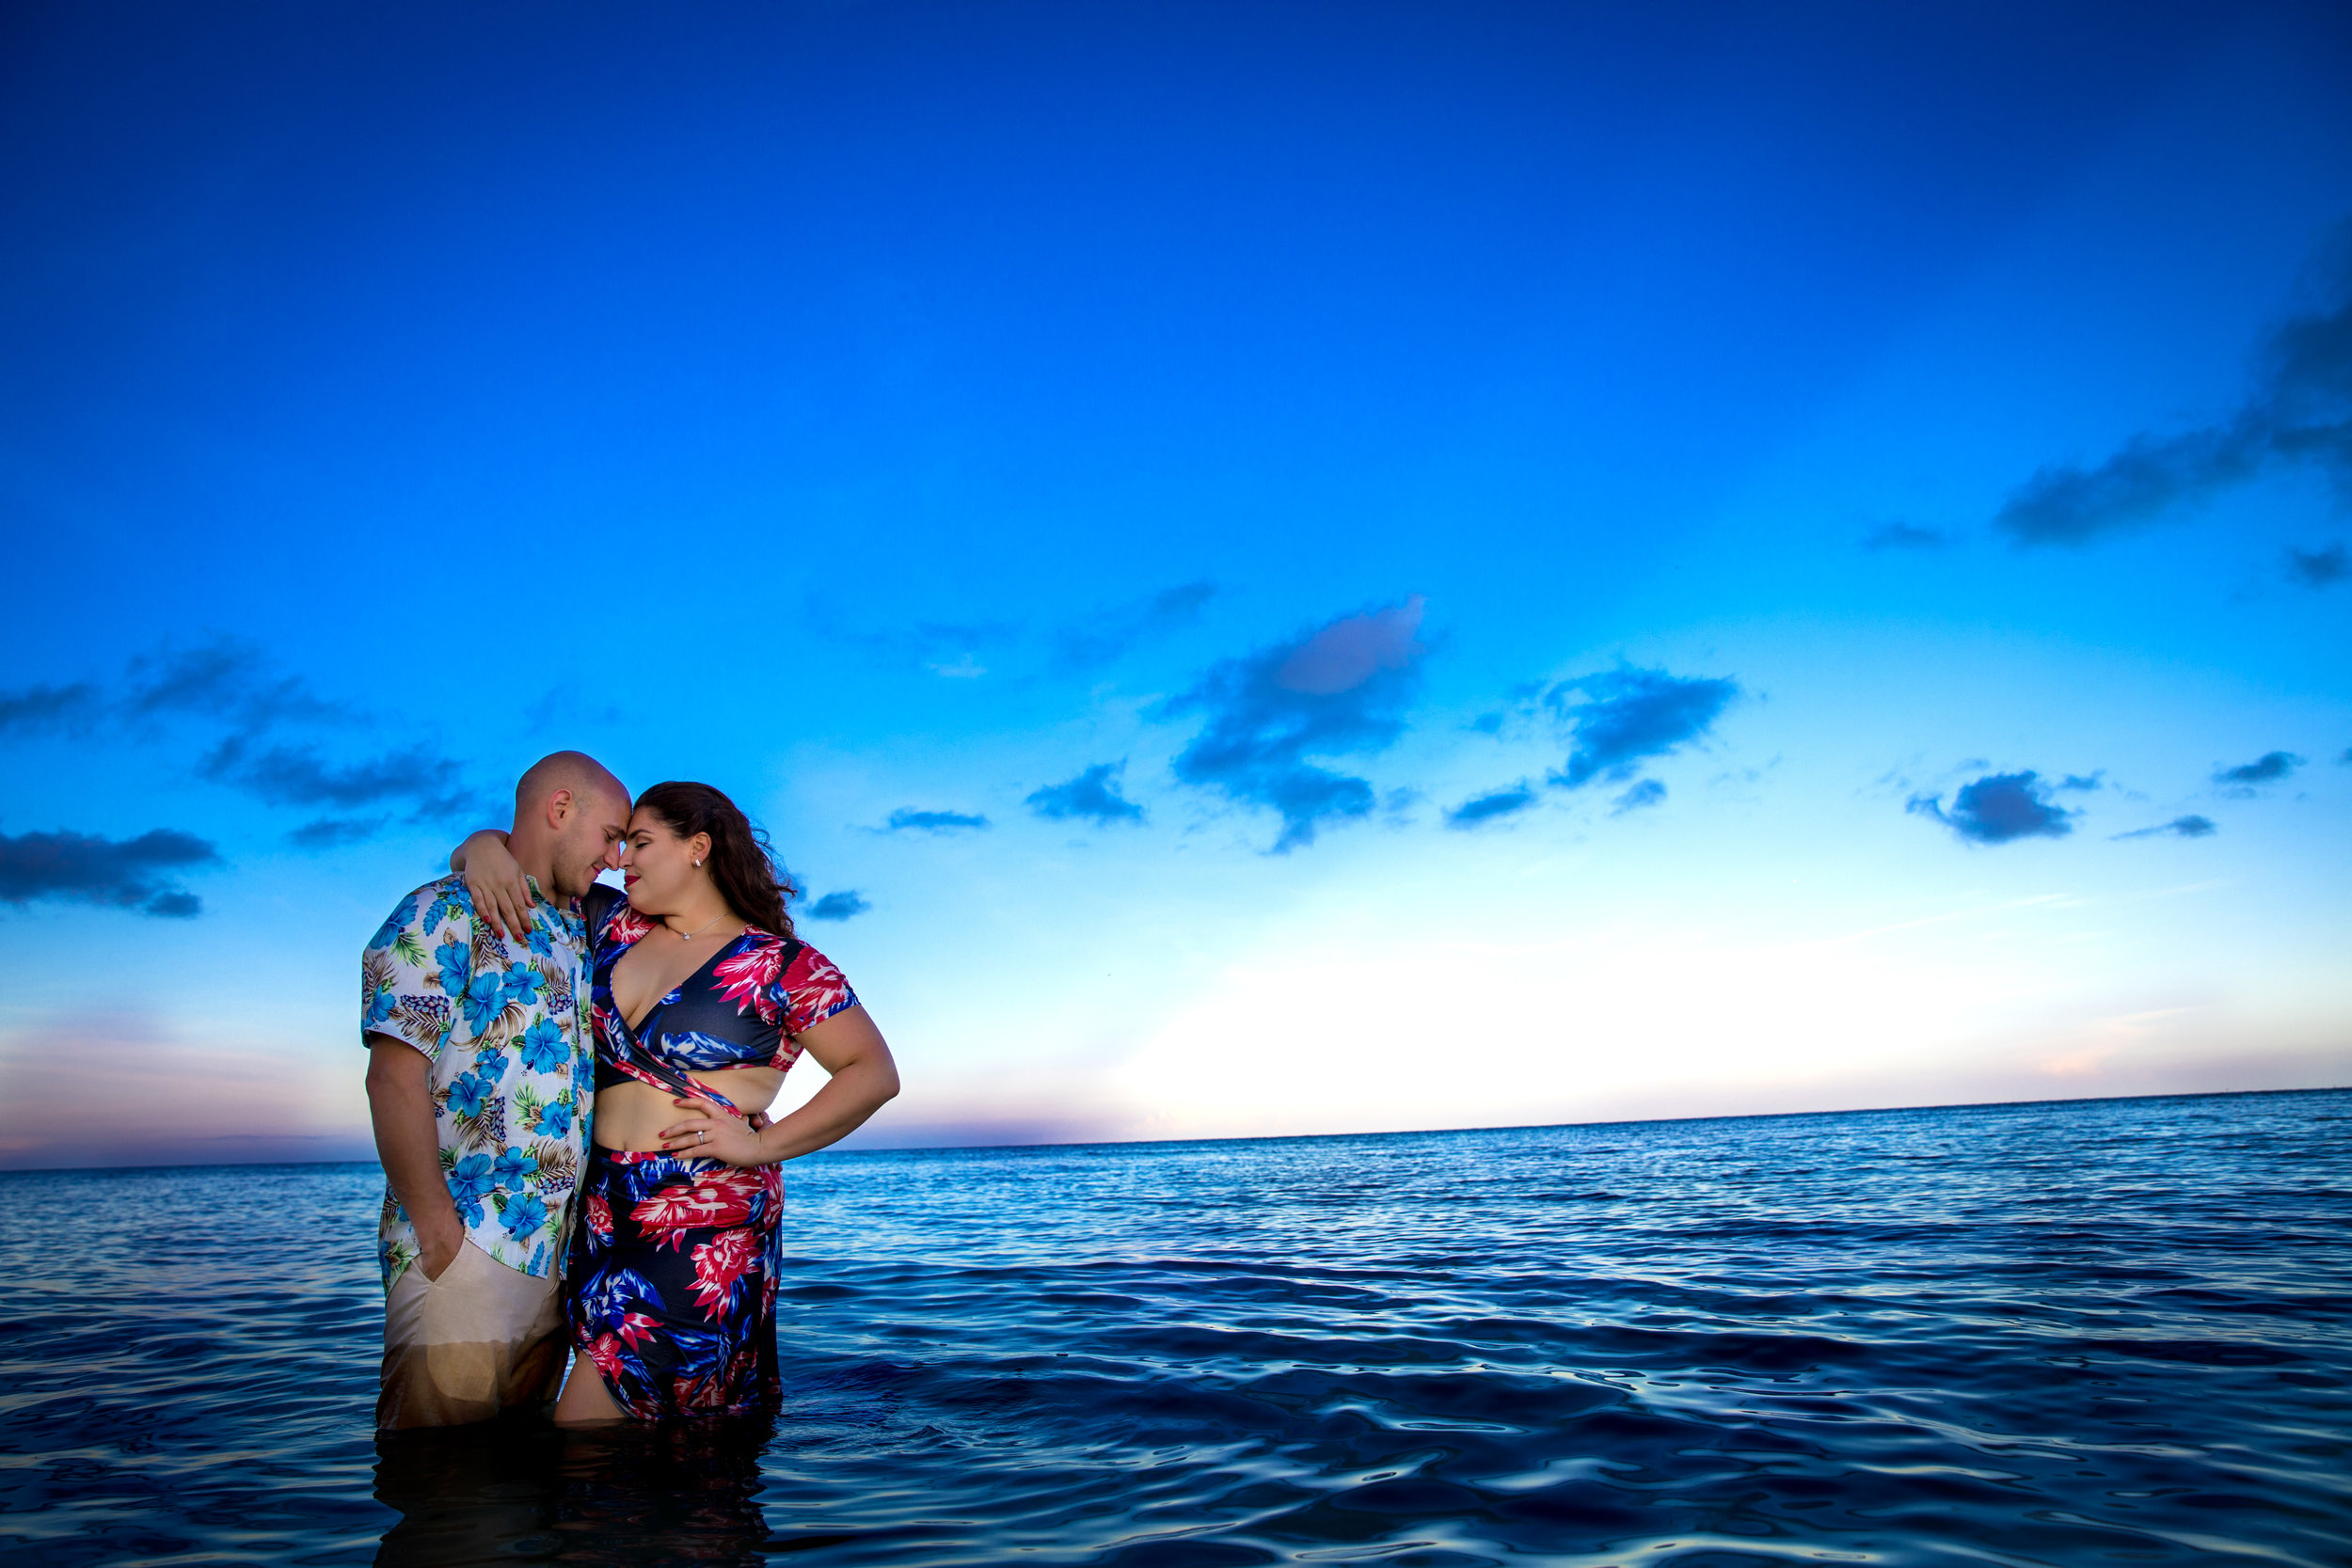 miami_beach_bill_baggs_lighthouse_engagement_560.jpg